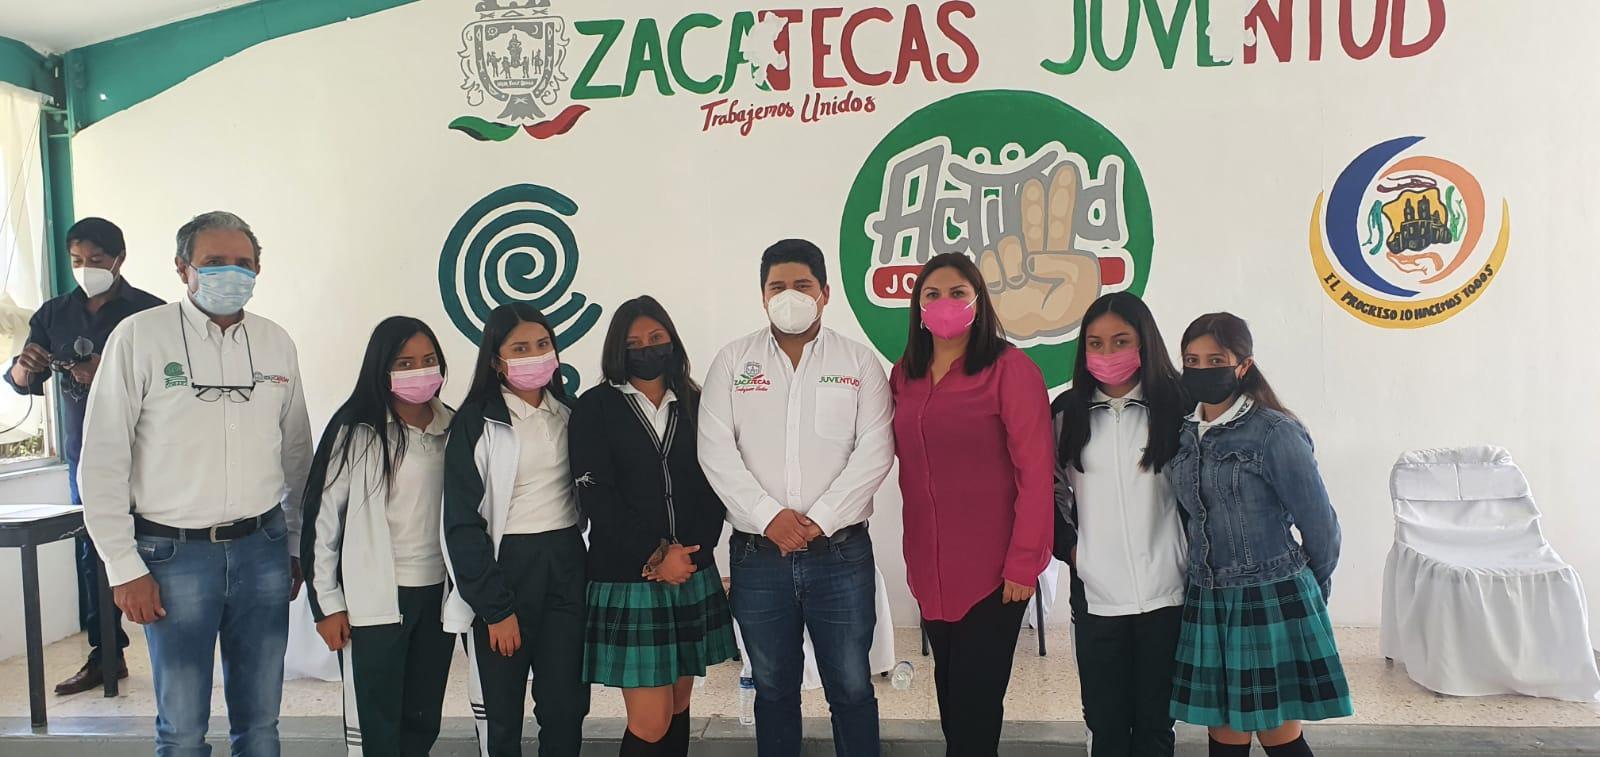 COBAEZ beneficia a más de 300 estudiantes a través de salón de usos múltiples